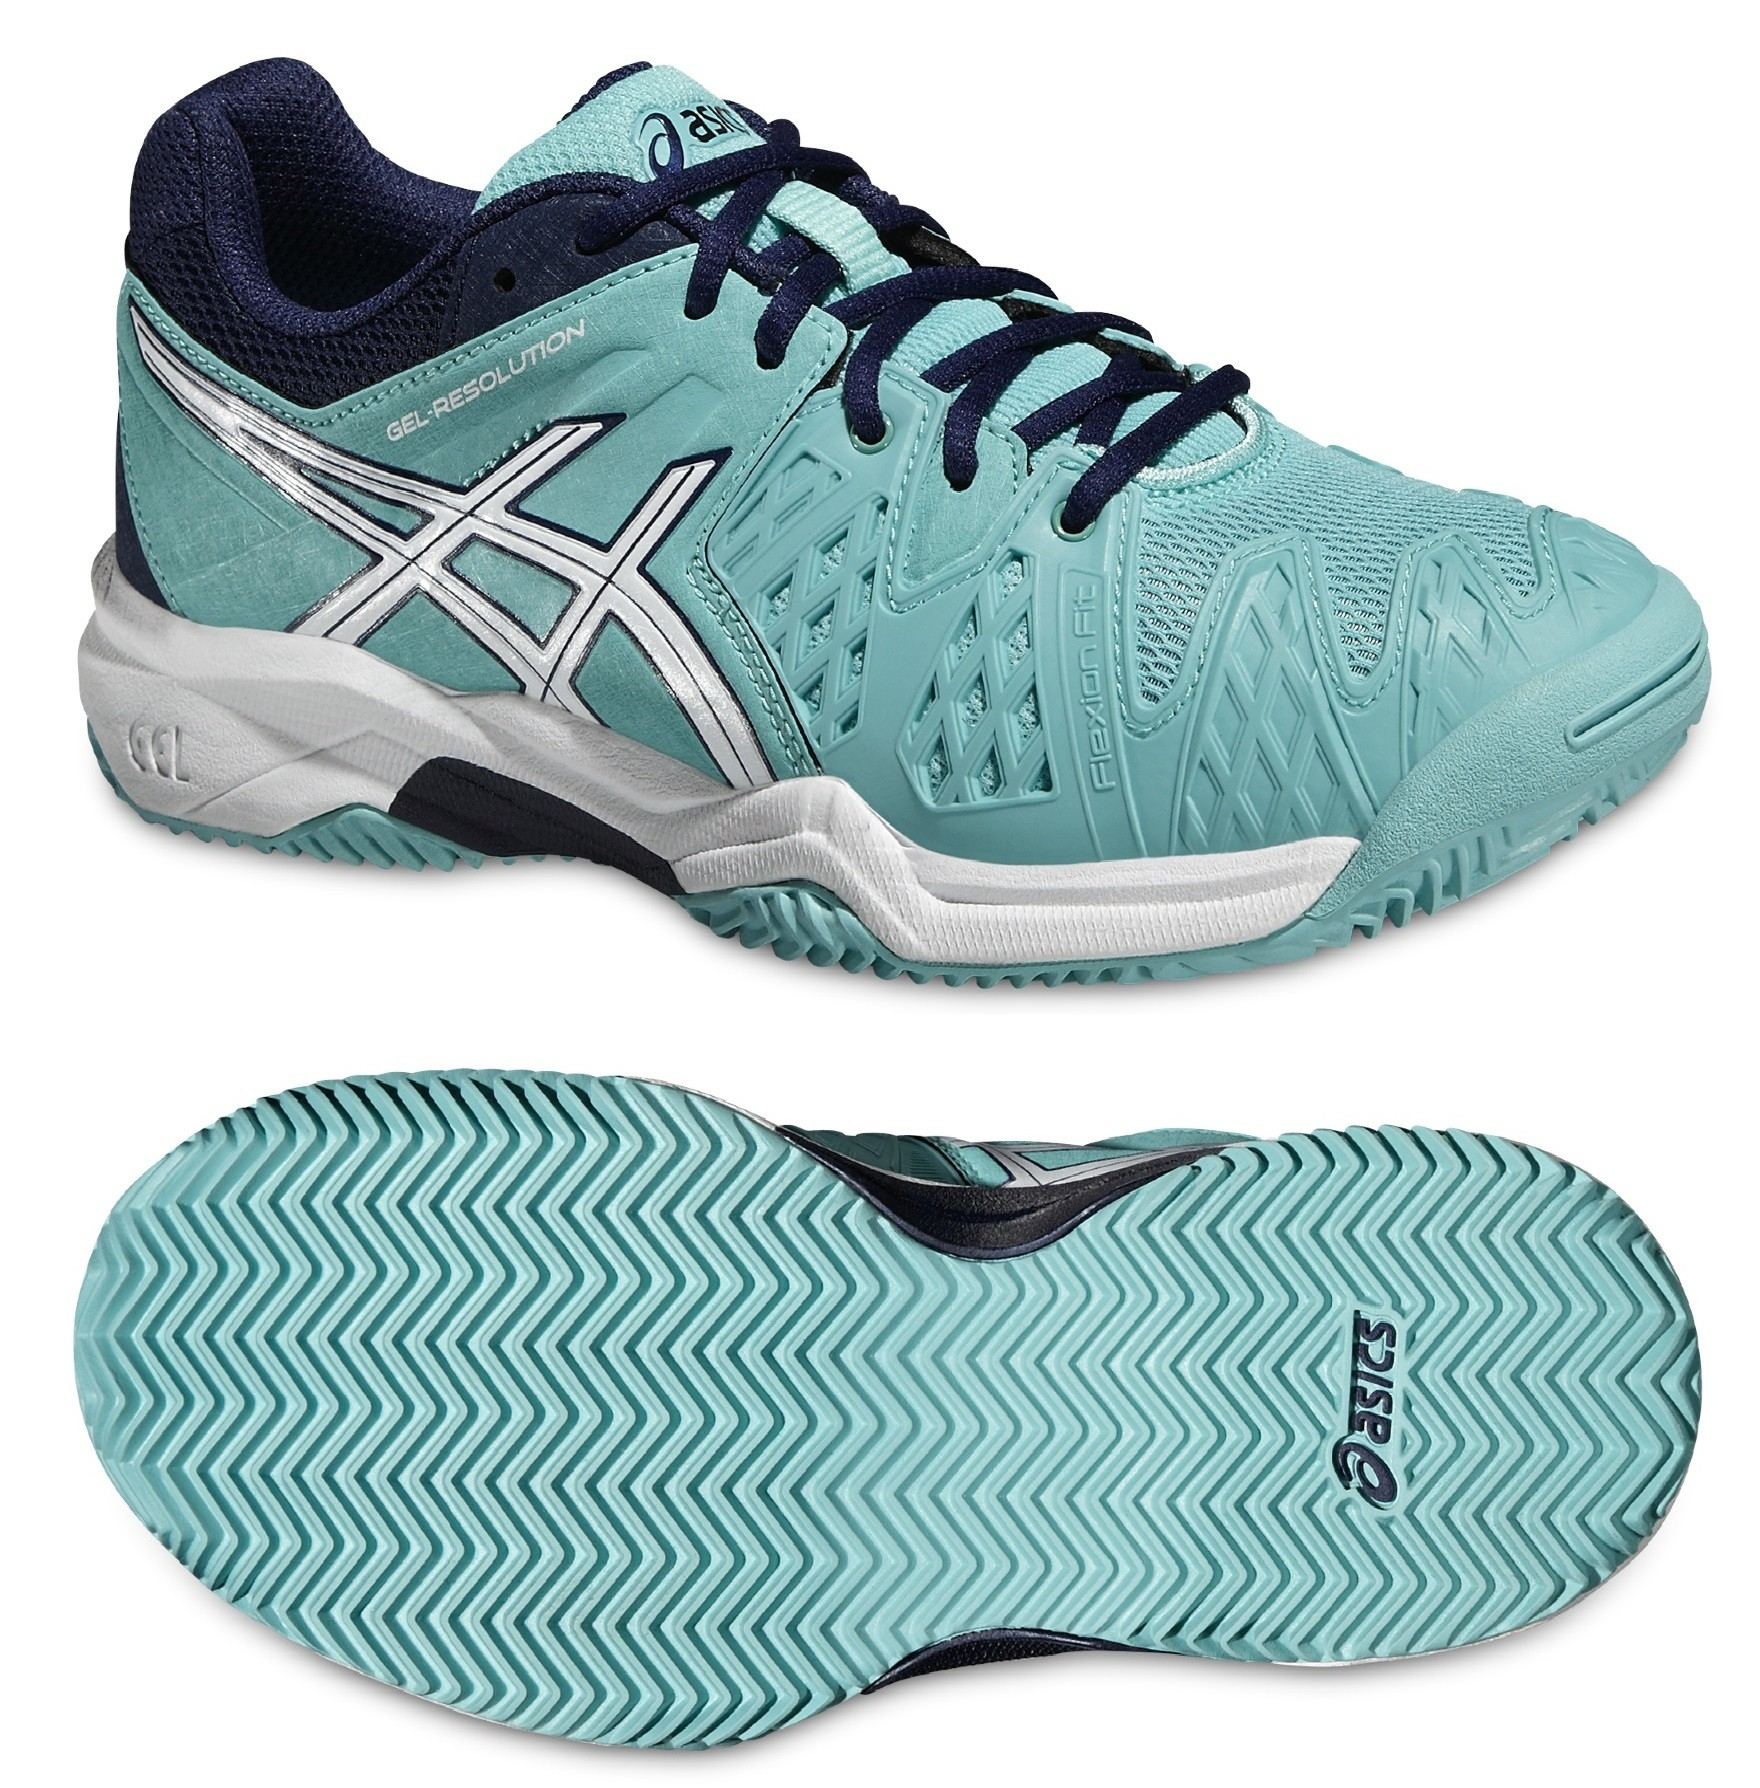 Dětská antuková obuv Asics Gel Resolution 6 Clay GS C501Y-3901 světle modrá 0b0fd94345